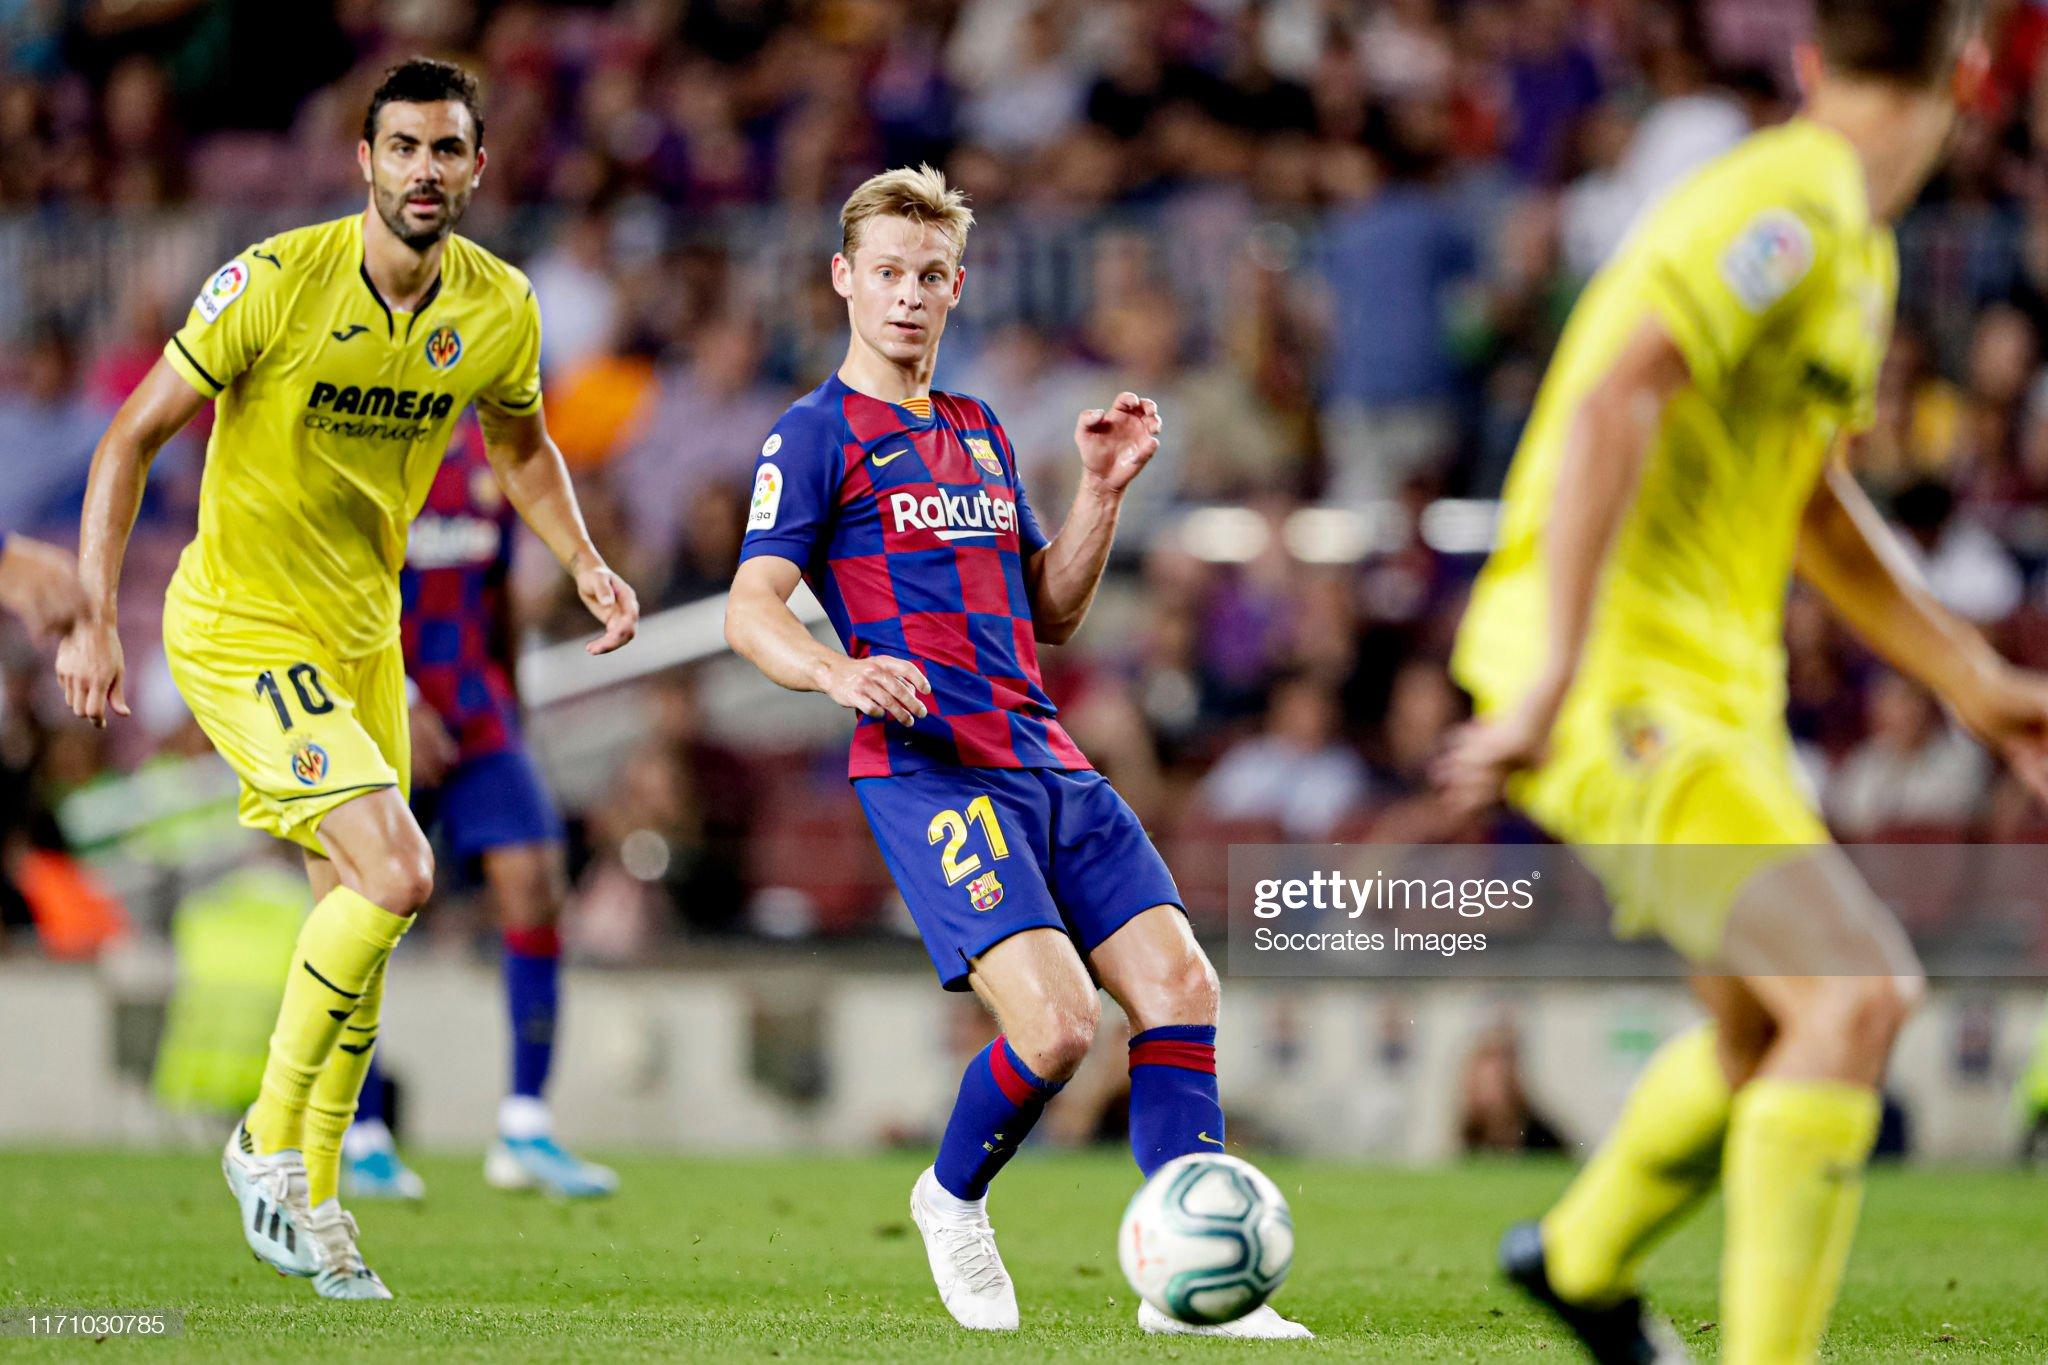 صور مباراة : برشلونة - فياريال 2-1 ( 24-09-2019 )  Frenkie-de-jong-of-fc-barcelona-during-the-la-liga-santander-match-picture-id1171030785?s=2048x2048